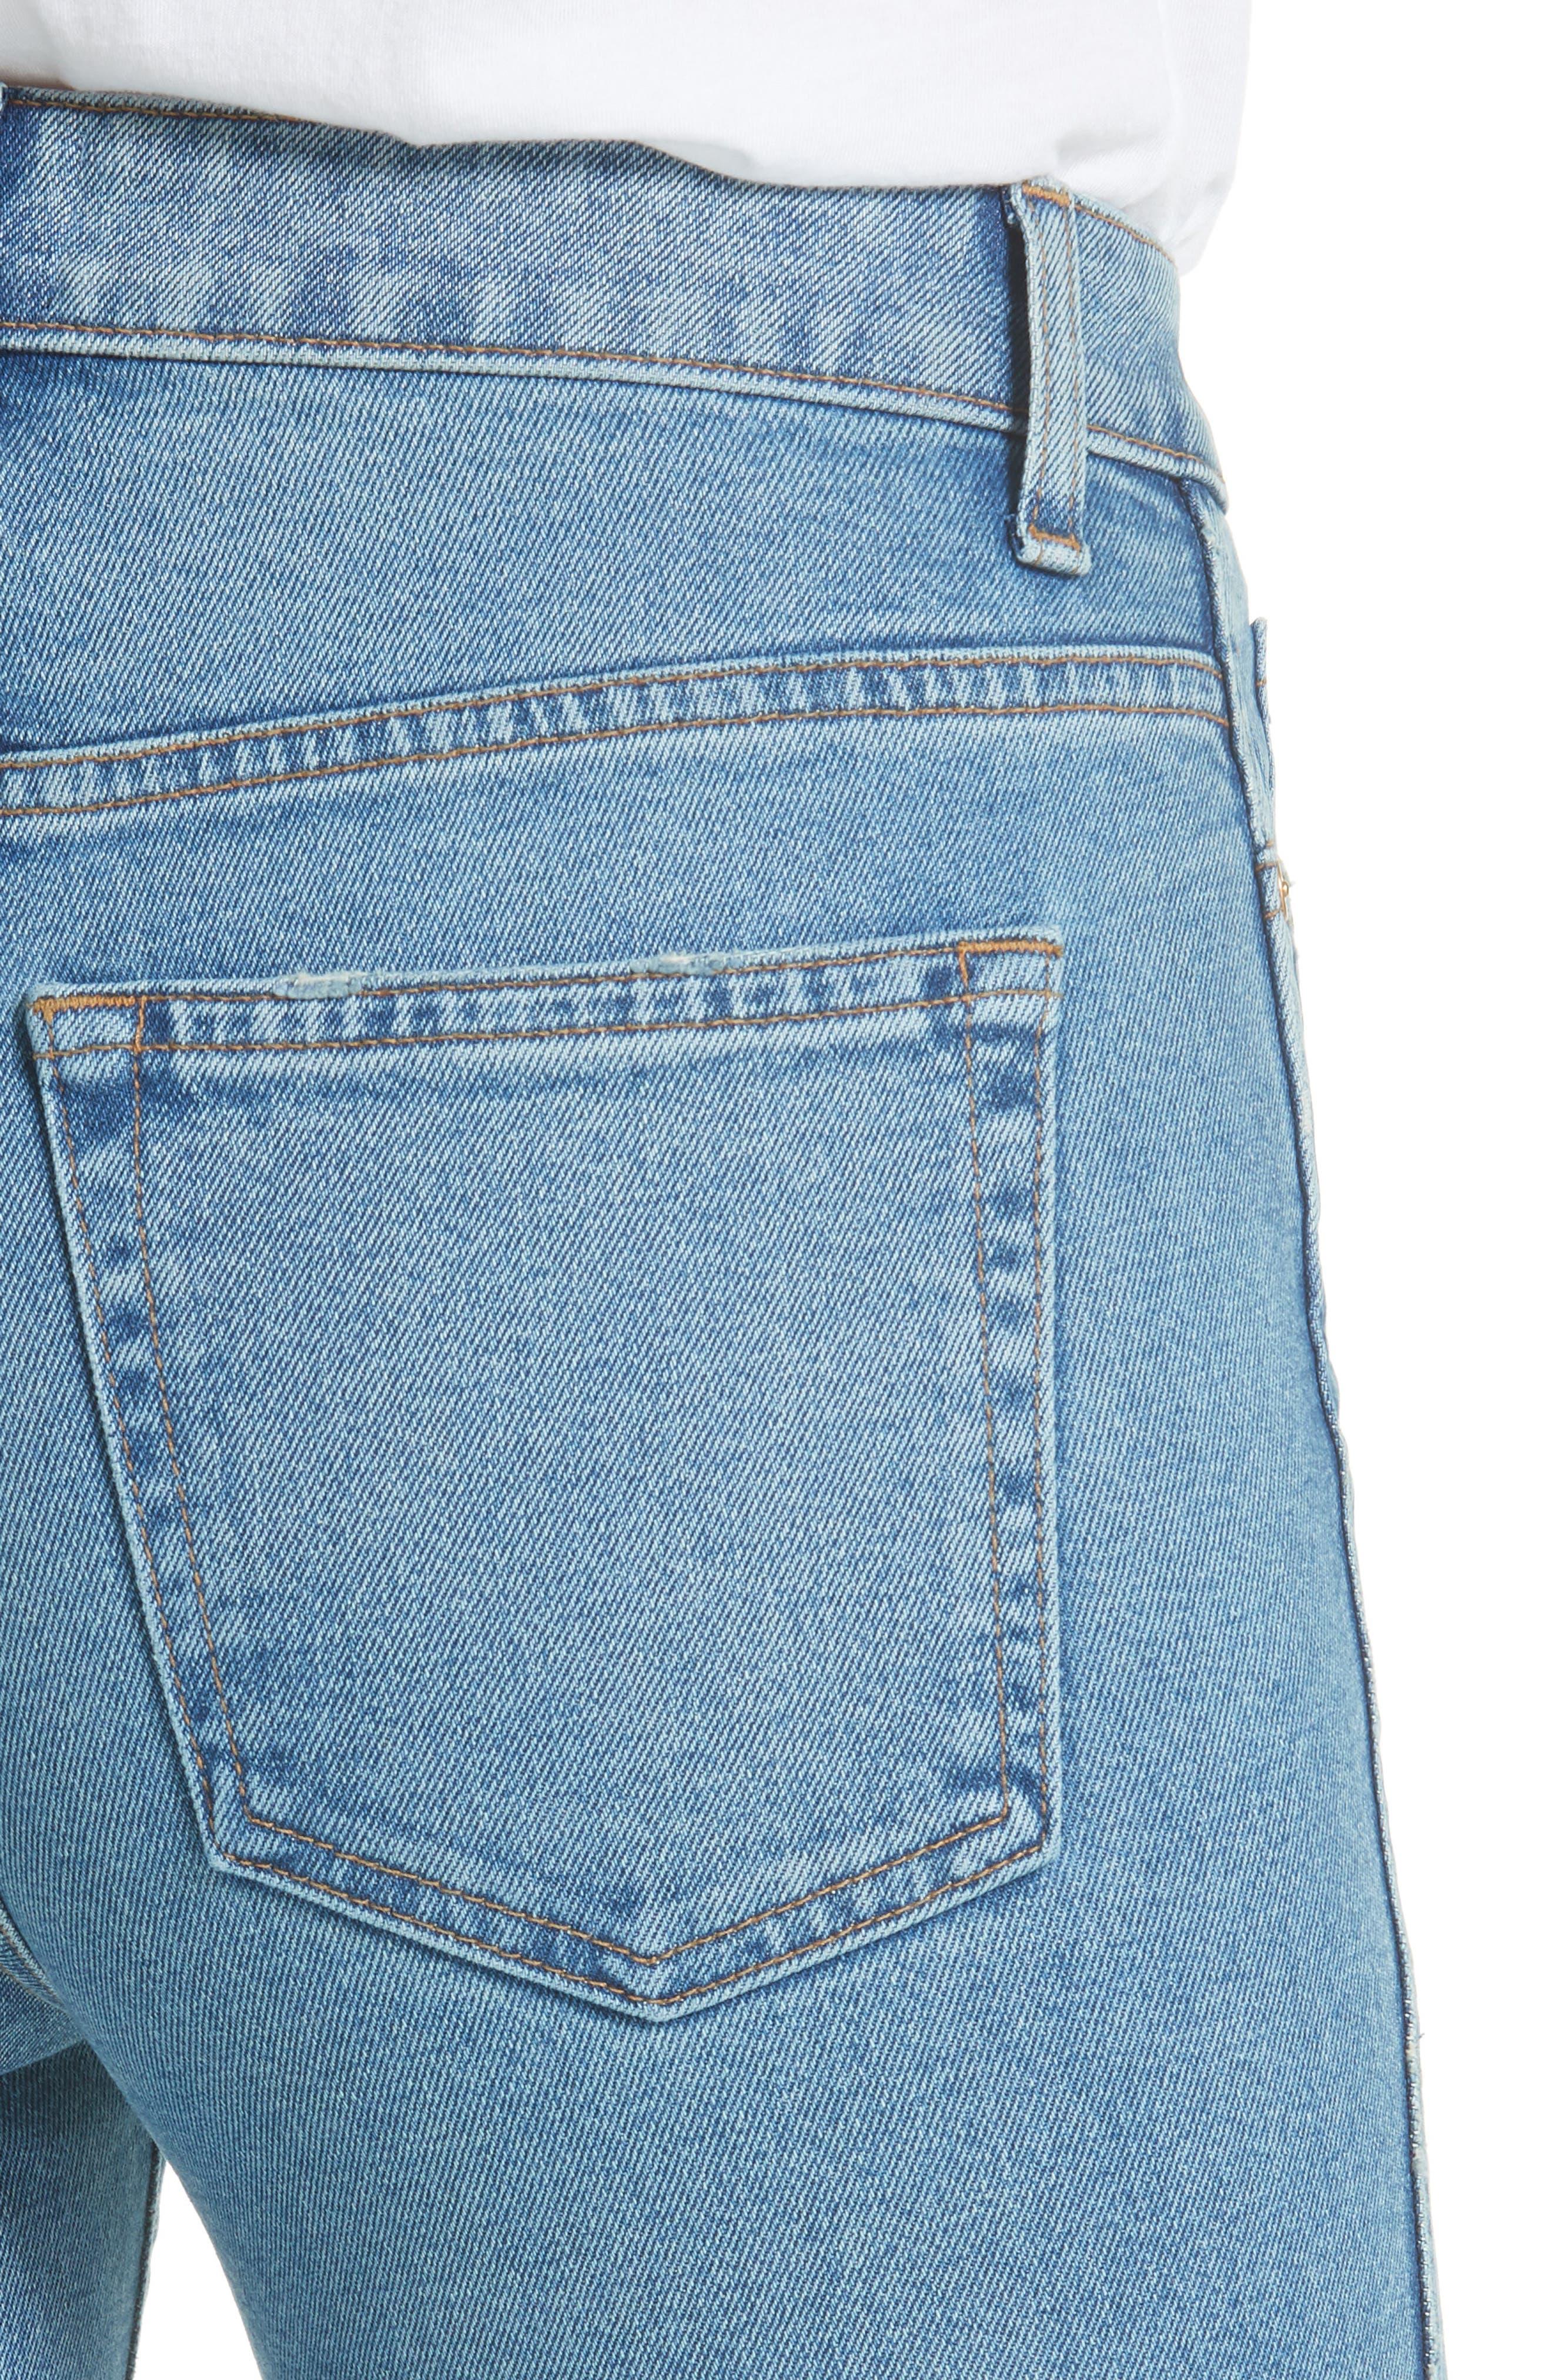 Reece Flare Jeans,                             Alternate thumbnail 4, color,                             401